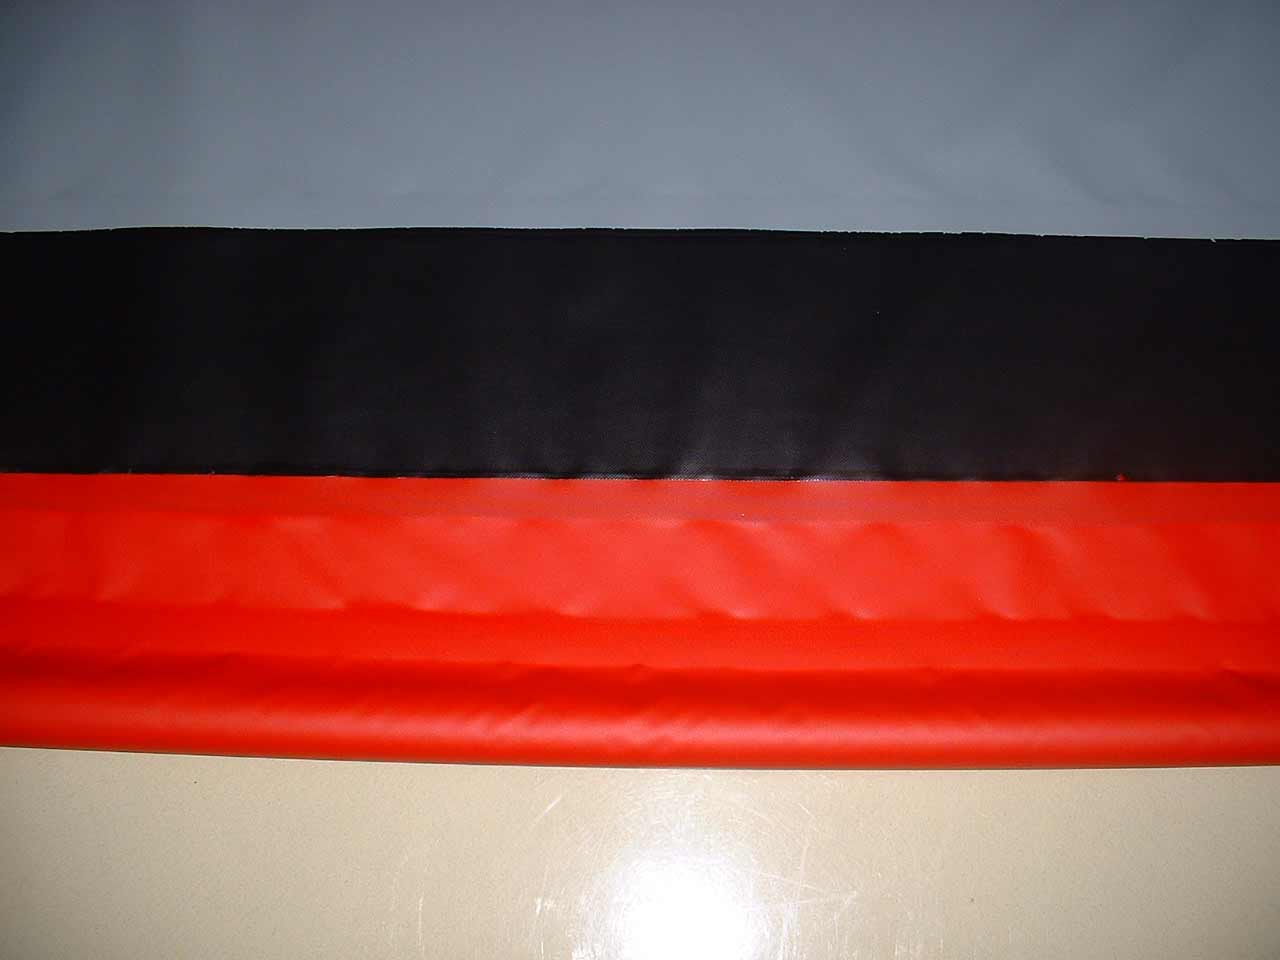 garagenmatte-rot-grau-3